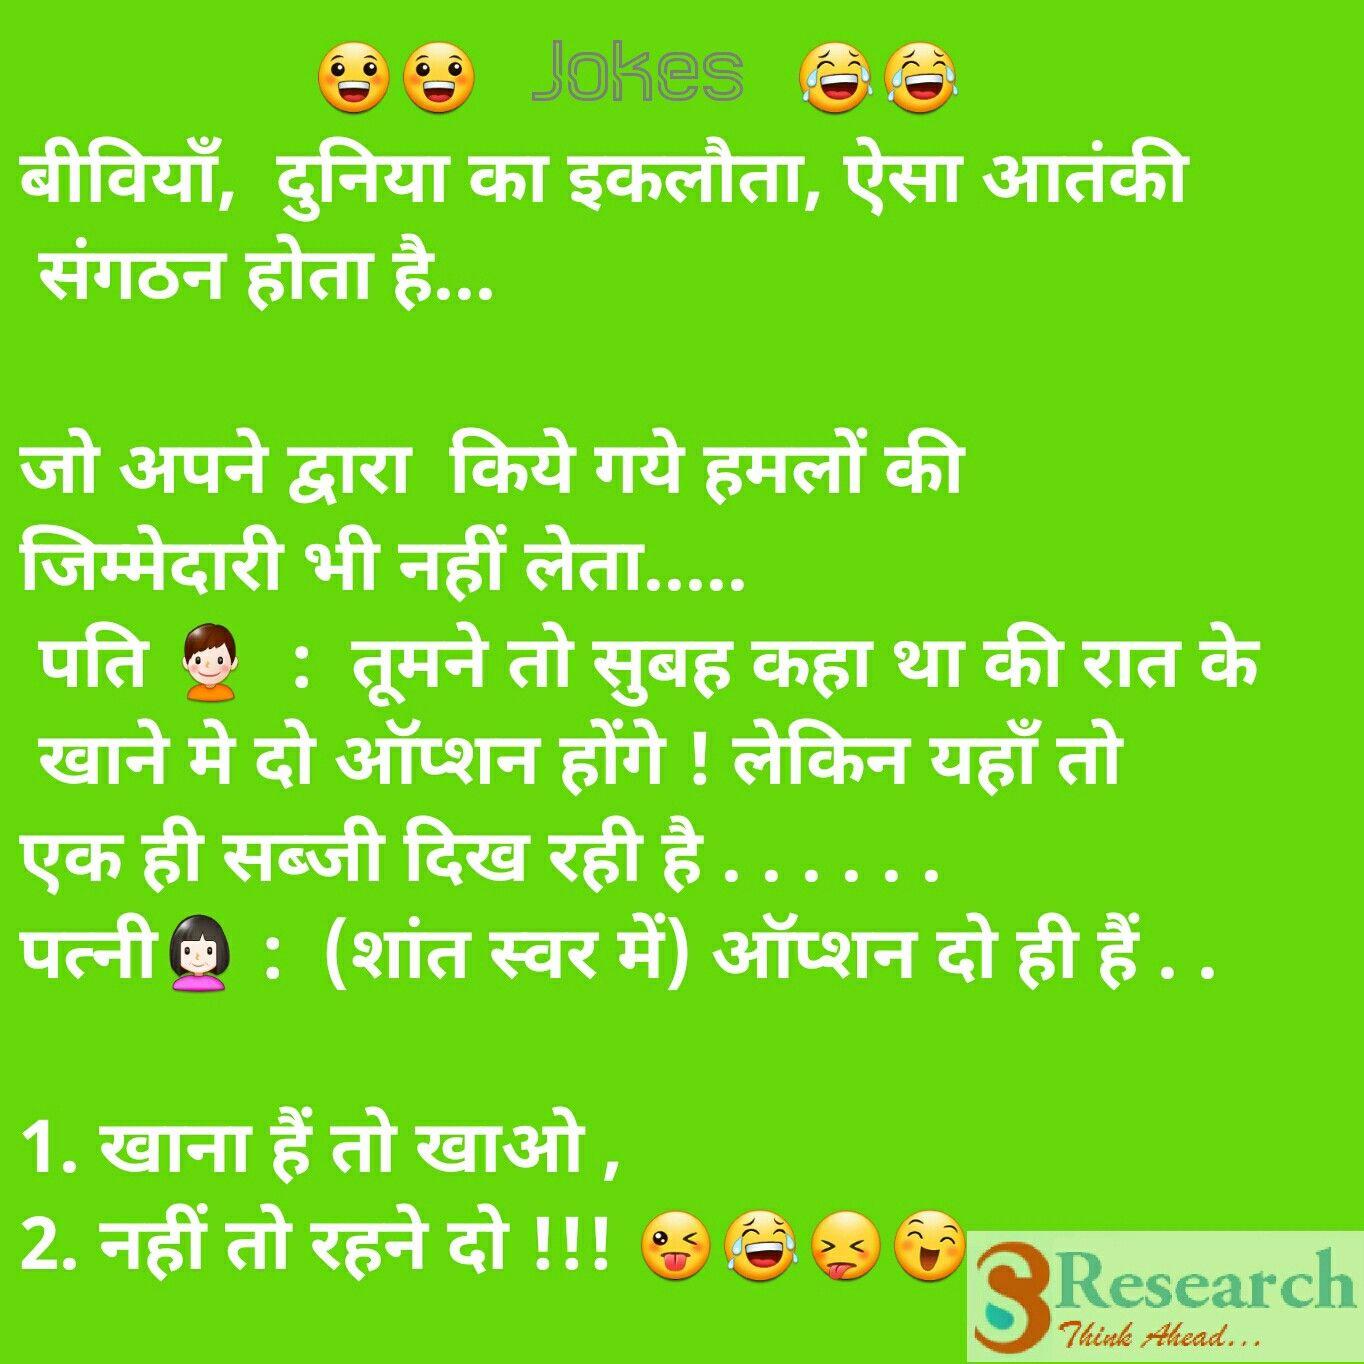 Pin by Sadhna Goel on Riddles & jokes Funny jokes in